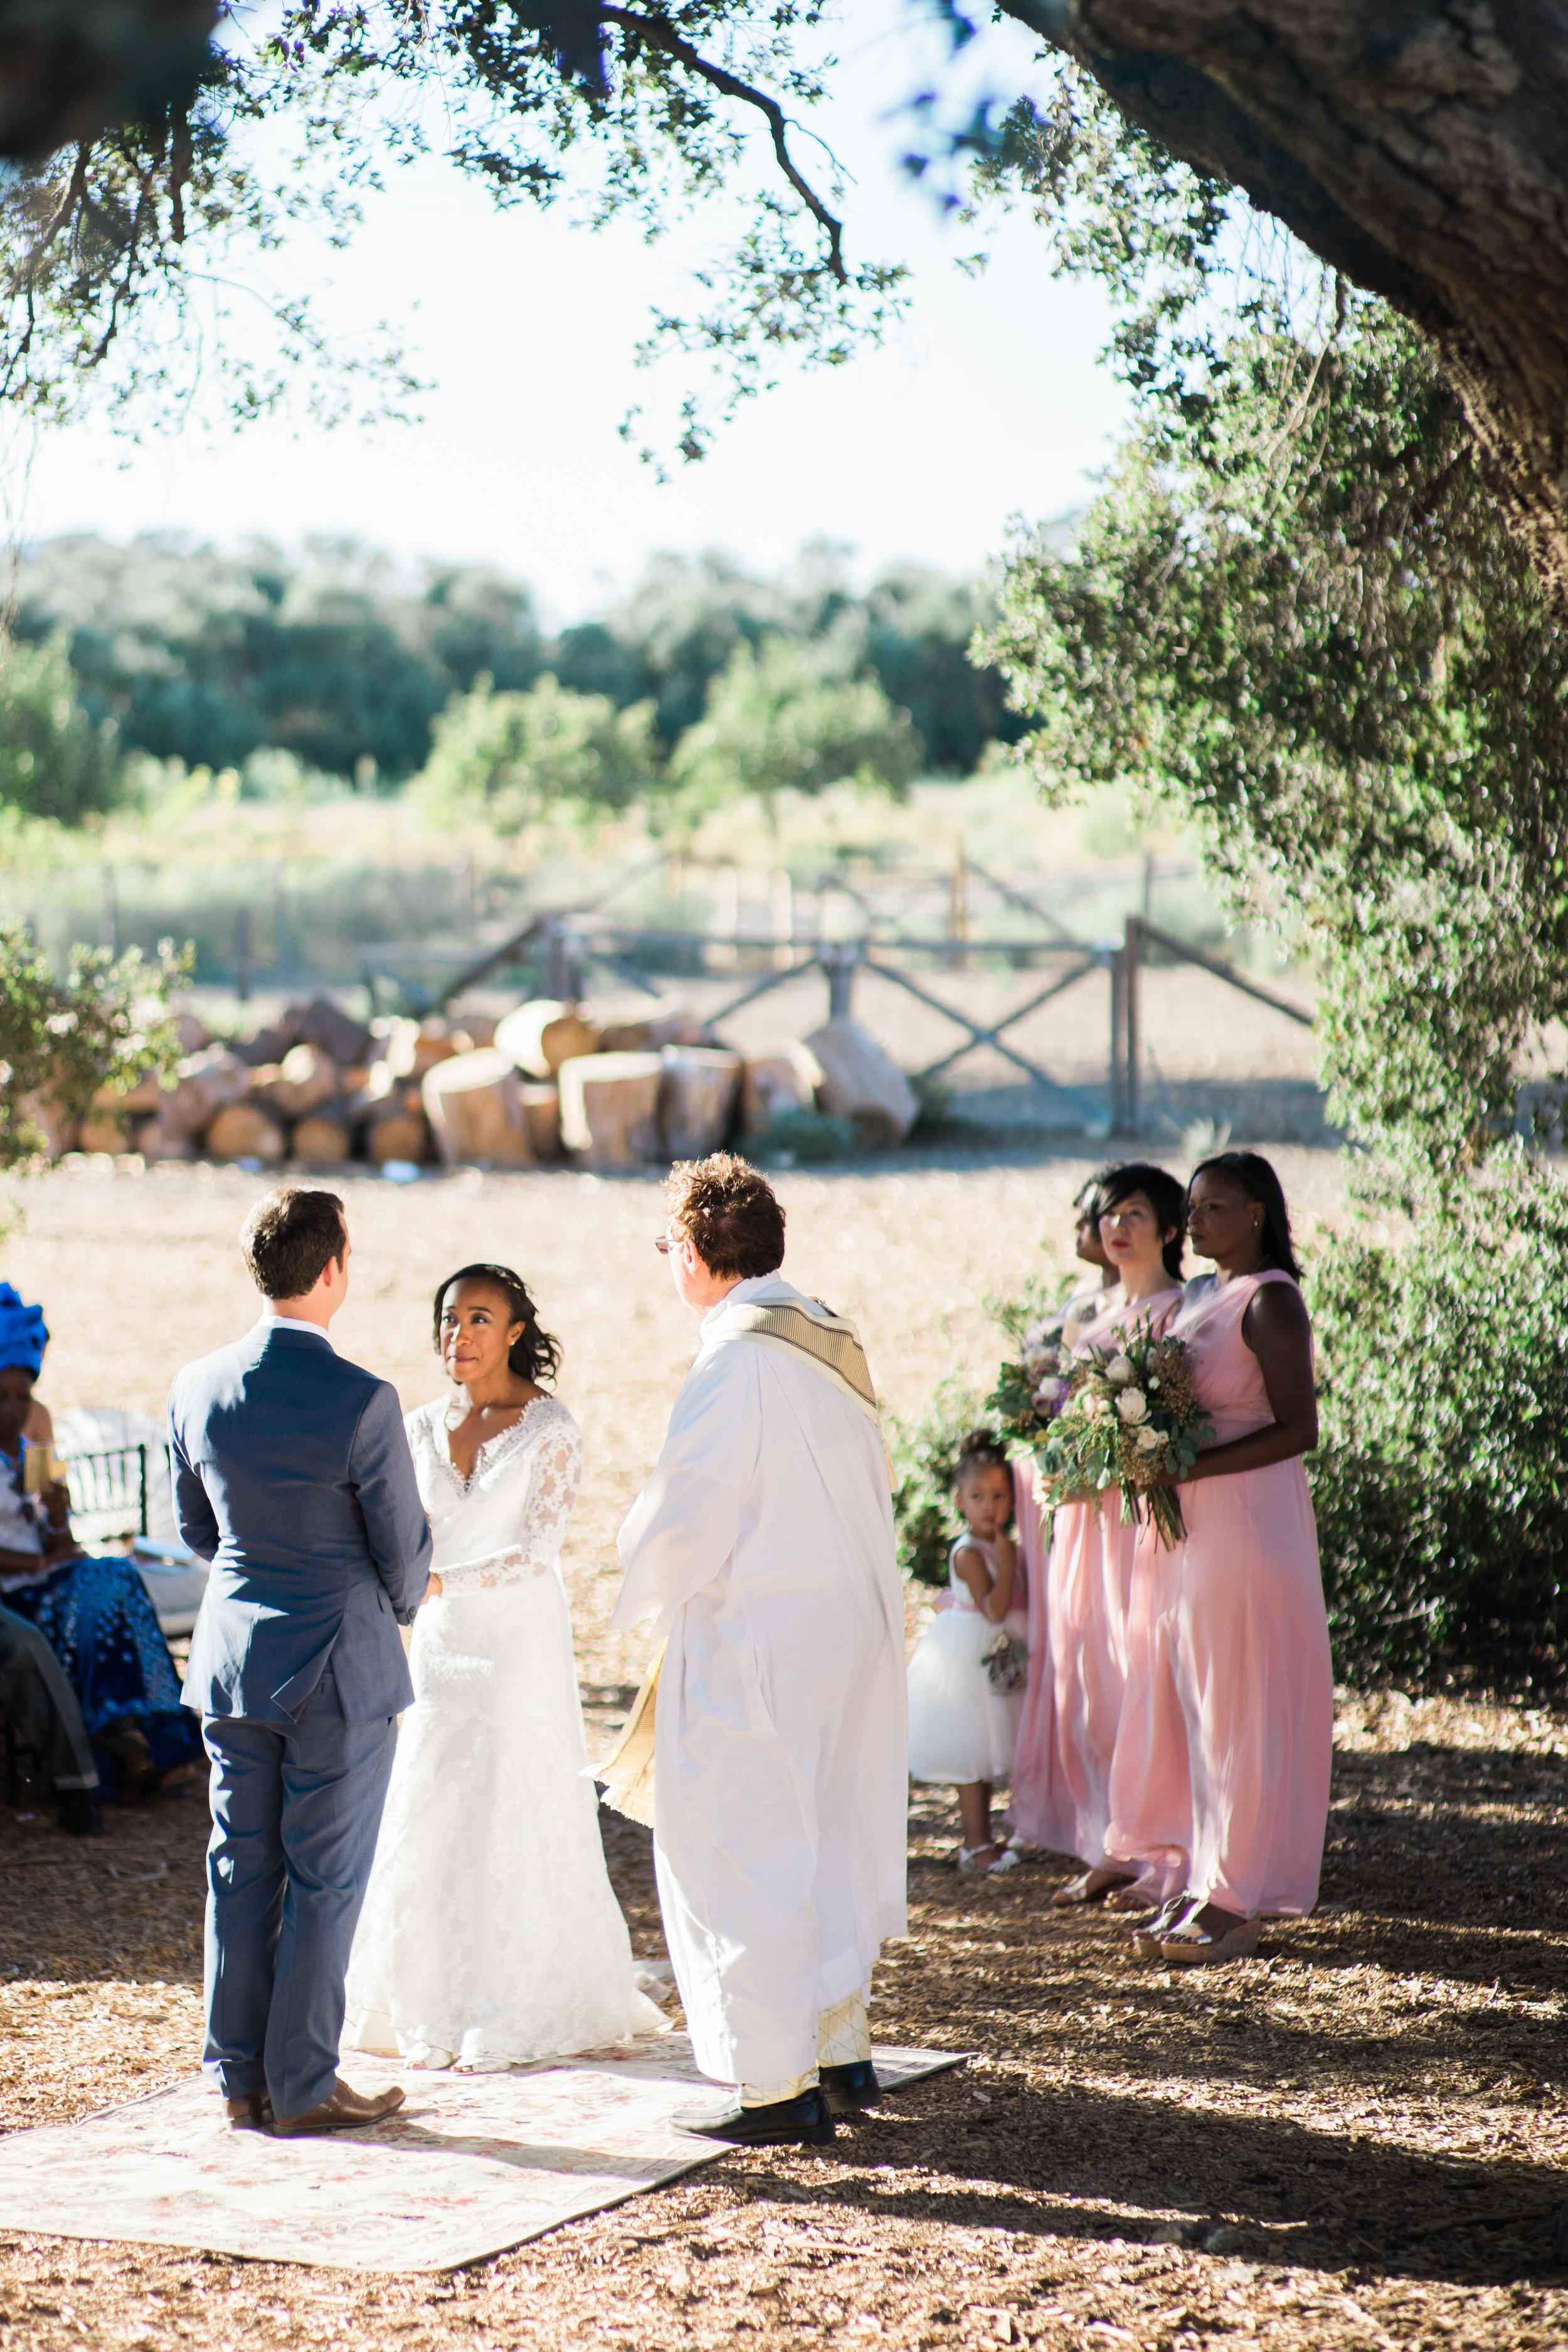 Jenny Quicksall Photography_www.jennyquicksall.com_California Wedding Photographer_Highland Springs Ranch and Inn Resort_Cherry Valley California (42).JPG